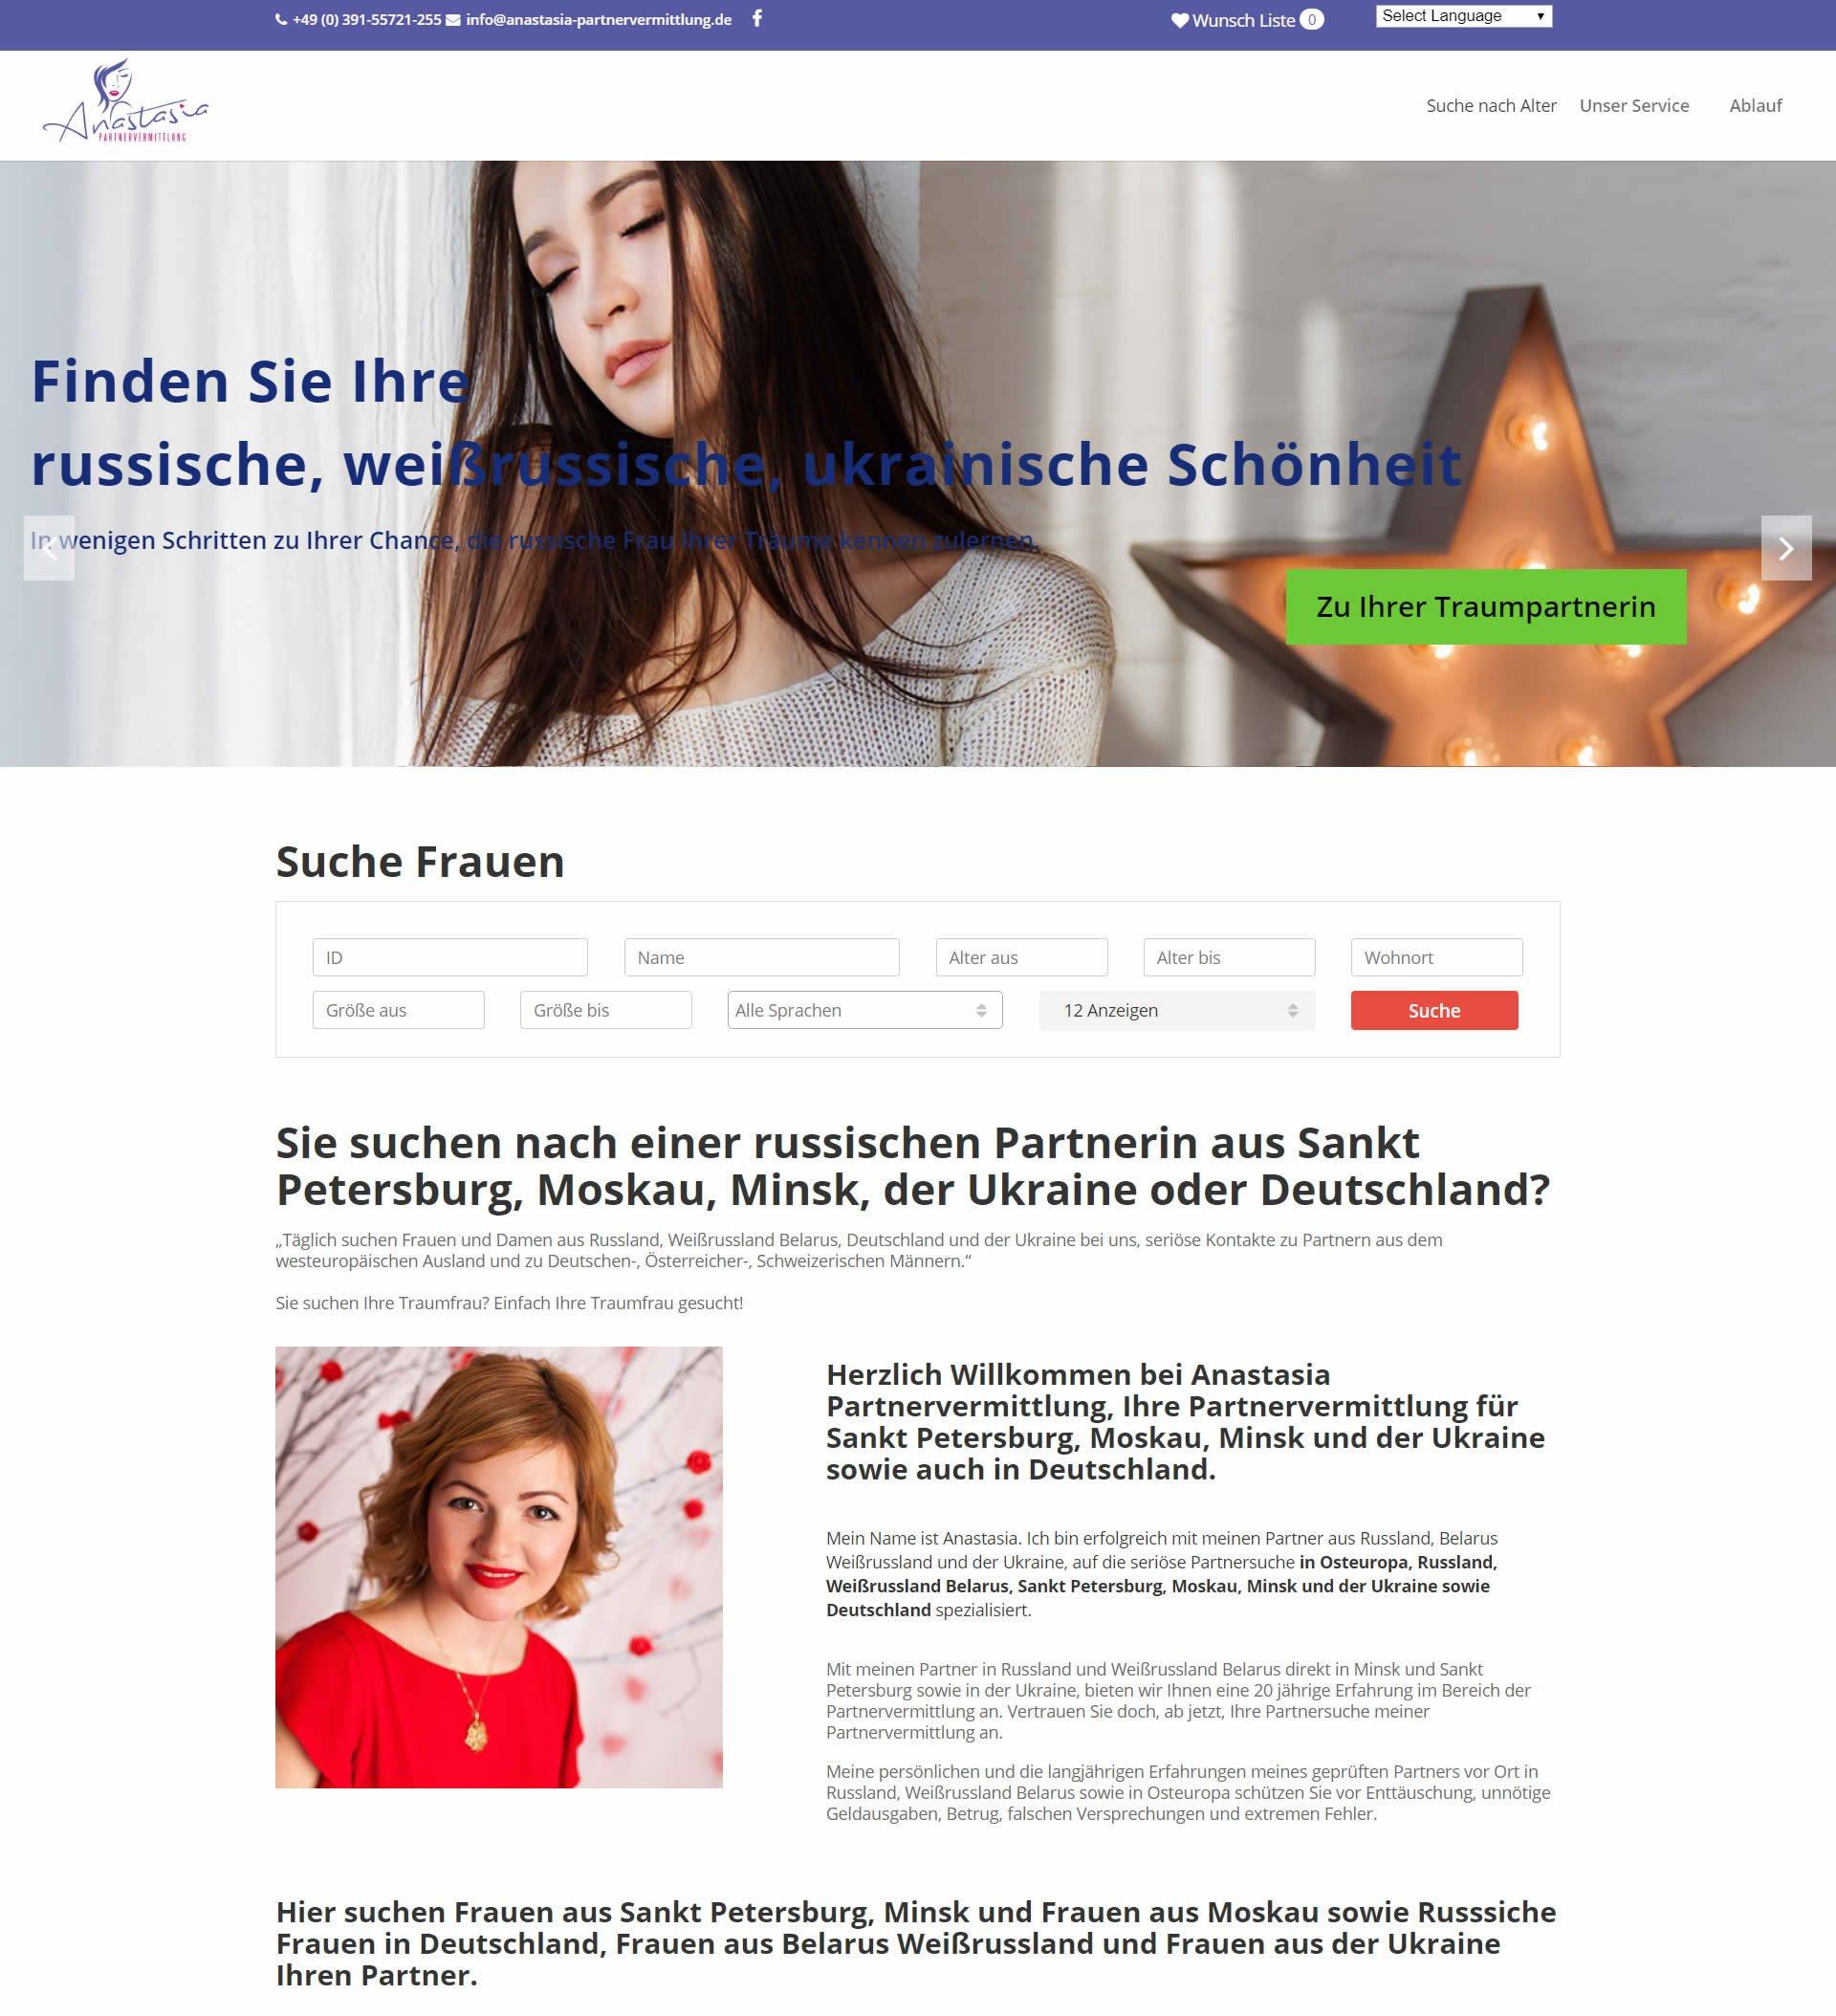 match-making-germany-website-1